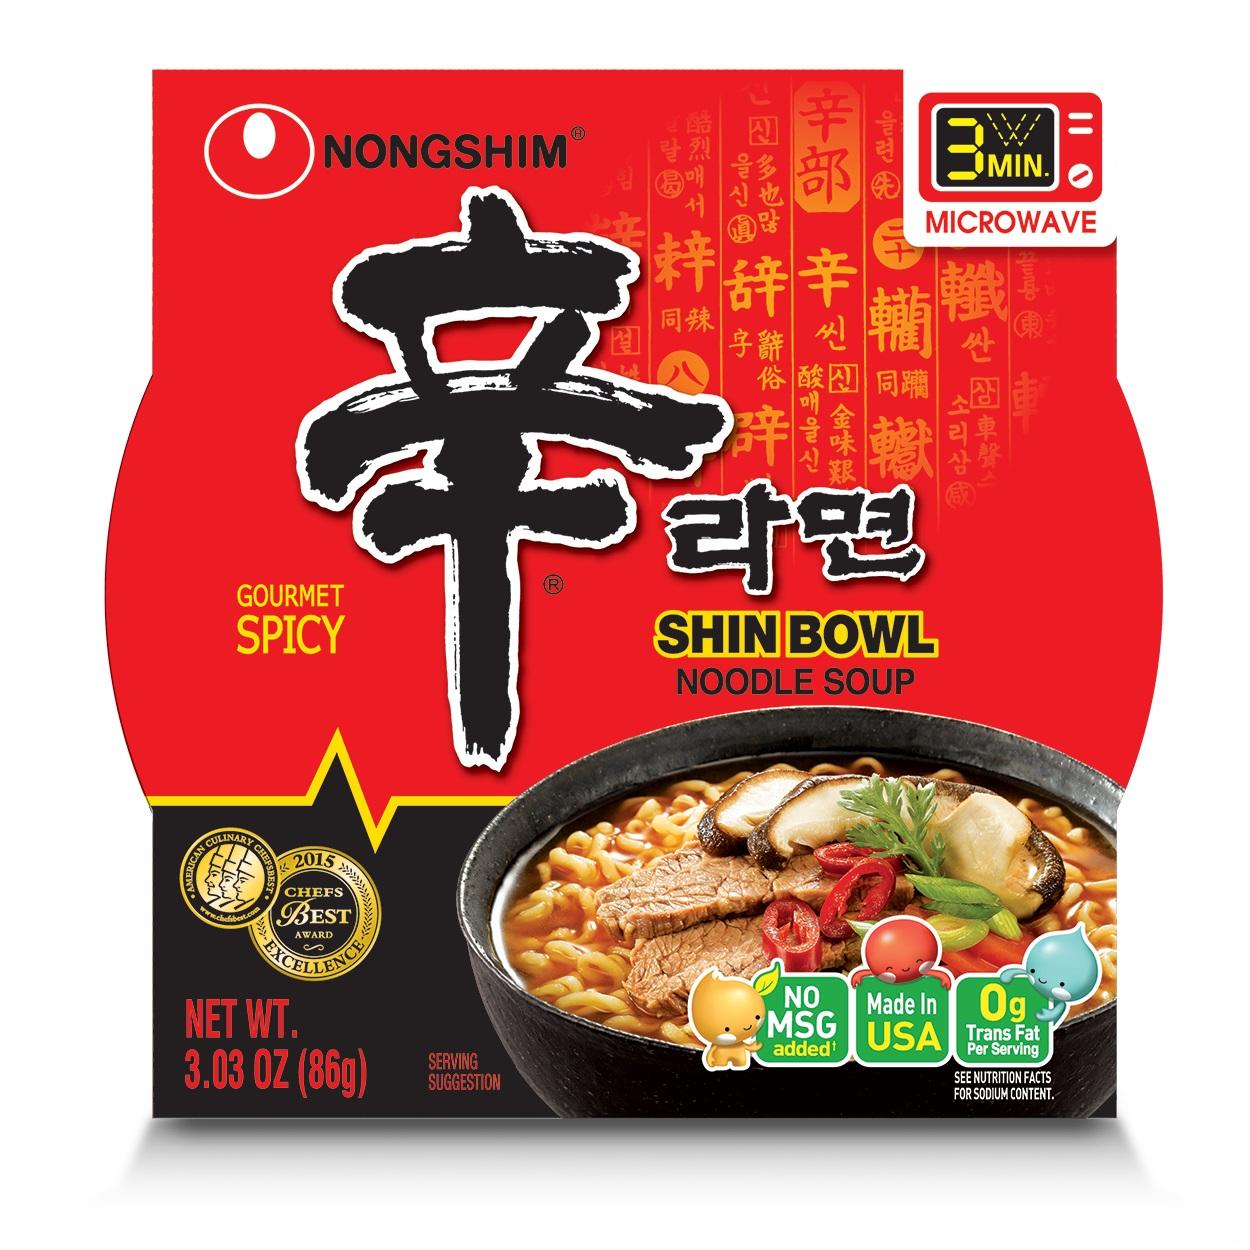 medium nongshim spicy instant noodle 12 x 86g l01VOWNX3